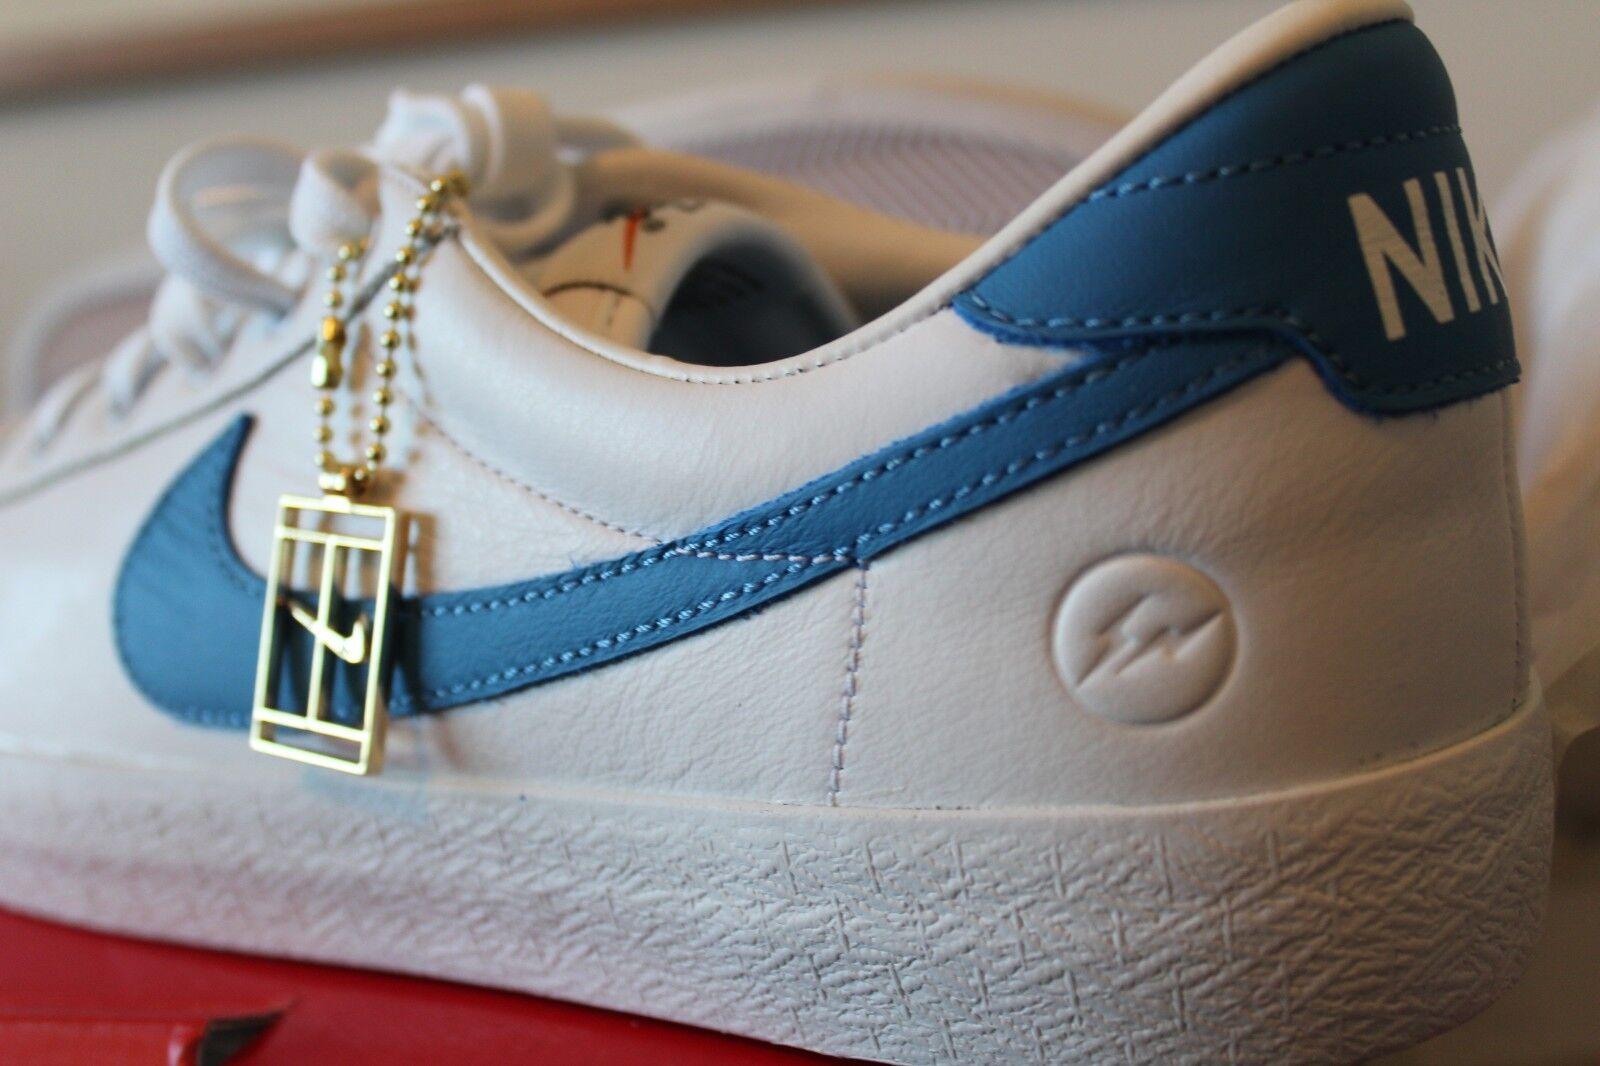 Nike Air Lauderdale Fragment - Size 11 - White bluee - 100% Original w Box